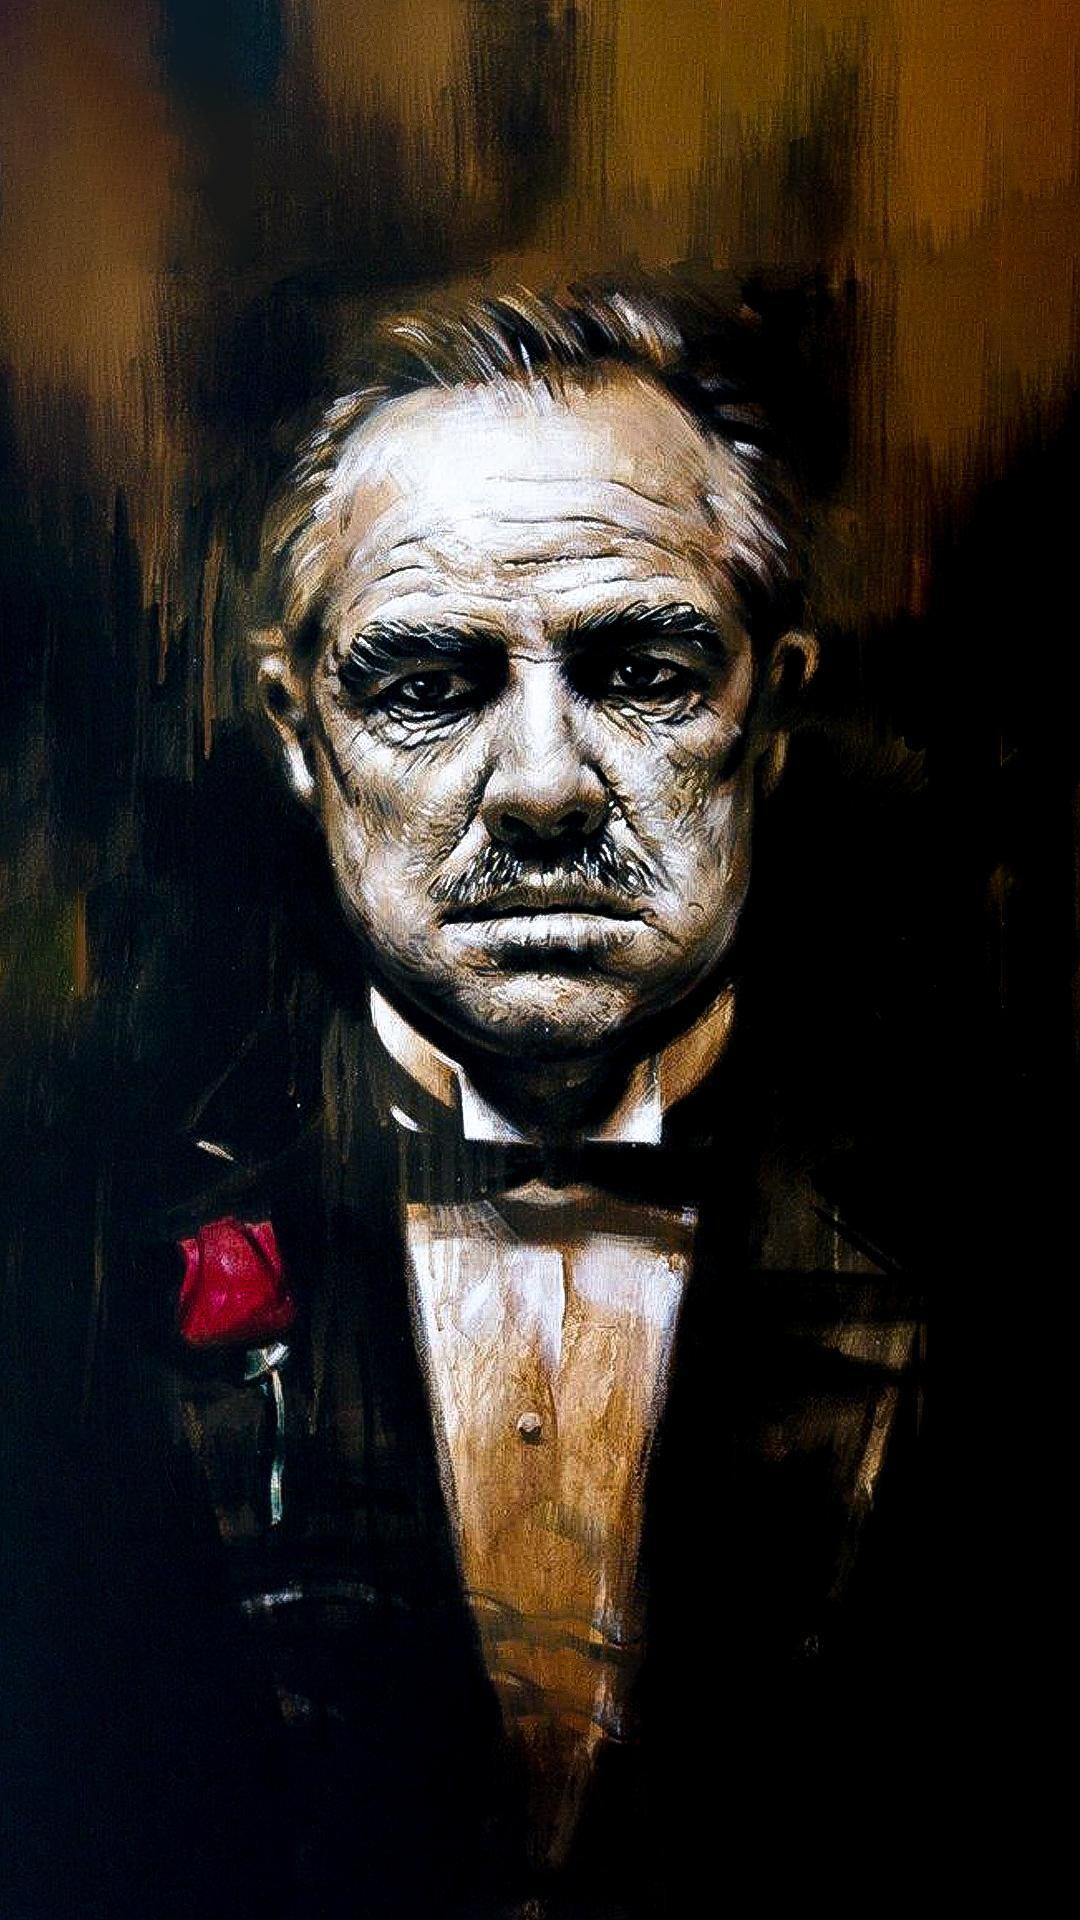 Don Vito Corleone Edited For Wallpaper Maffia Ekkor 2018 Circuit Board Tshirt Art Print By Callum Ritchie Society6